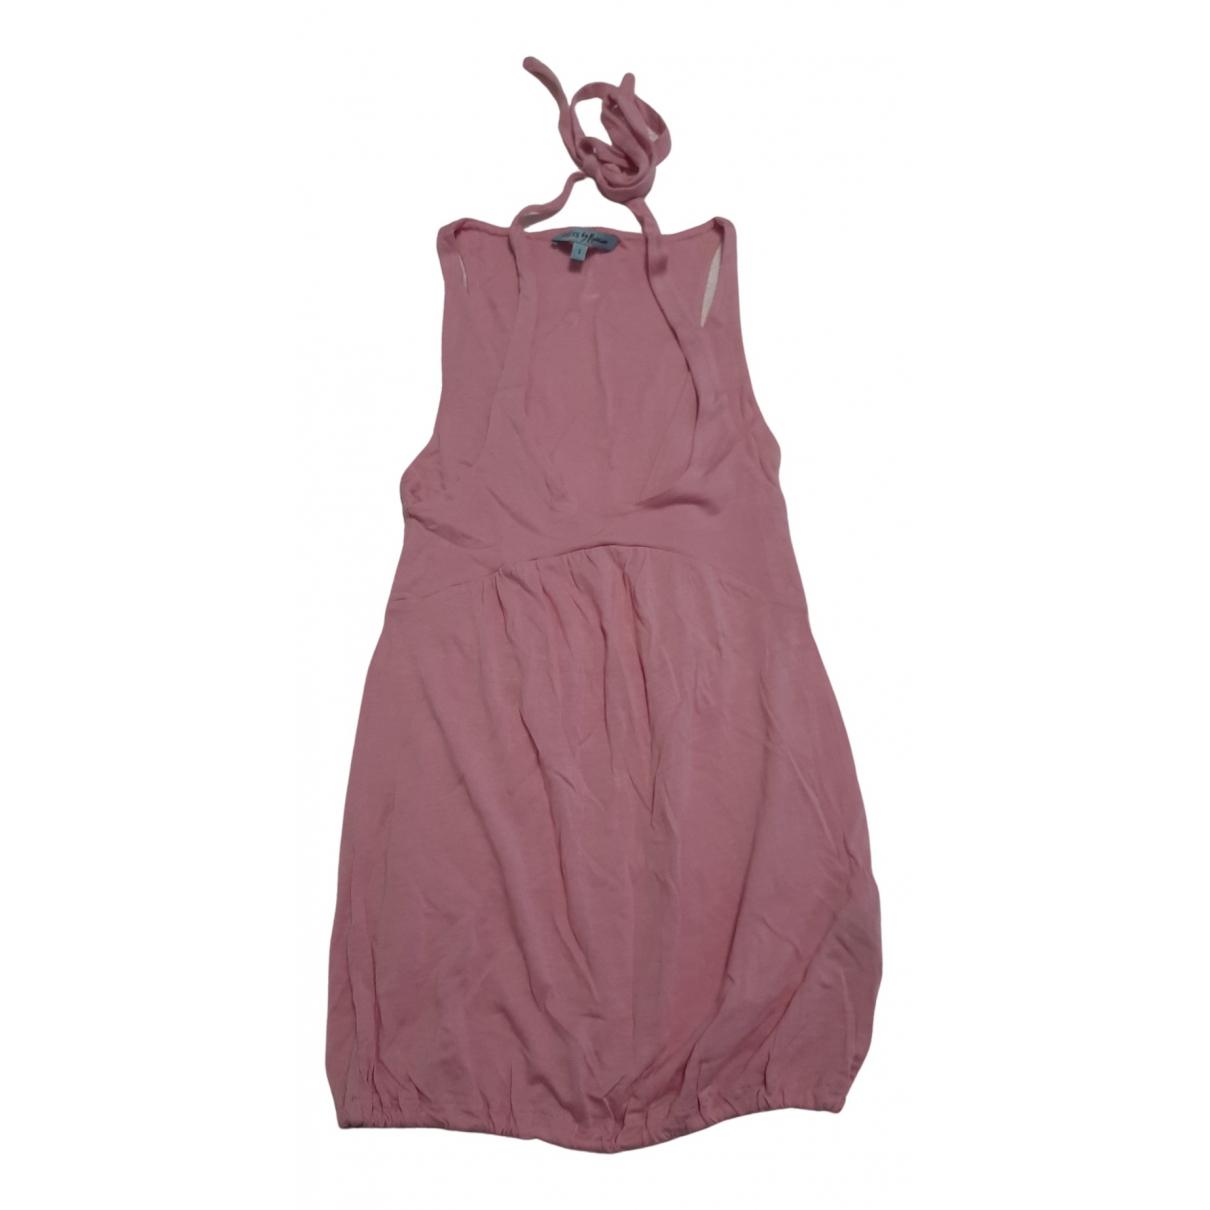 Guess N Pink Cotton  top for Women XS International